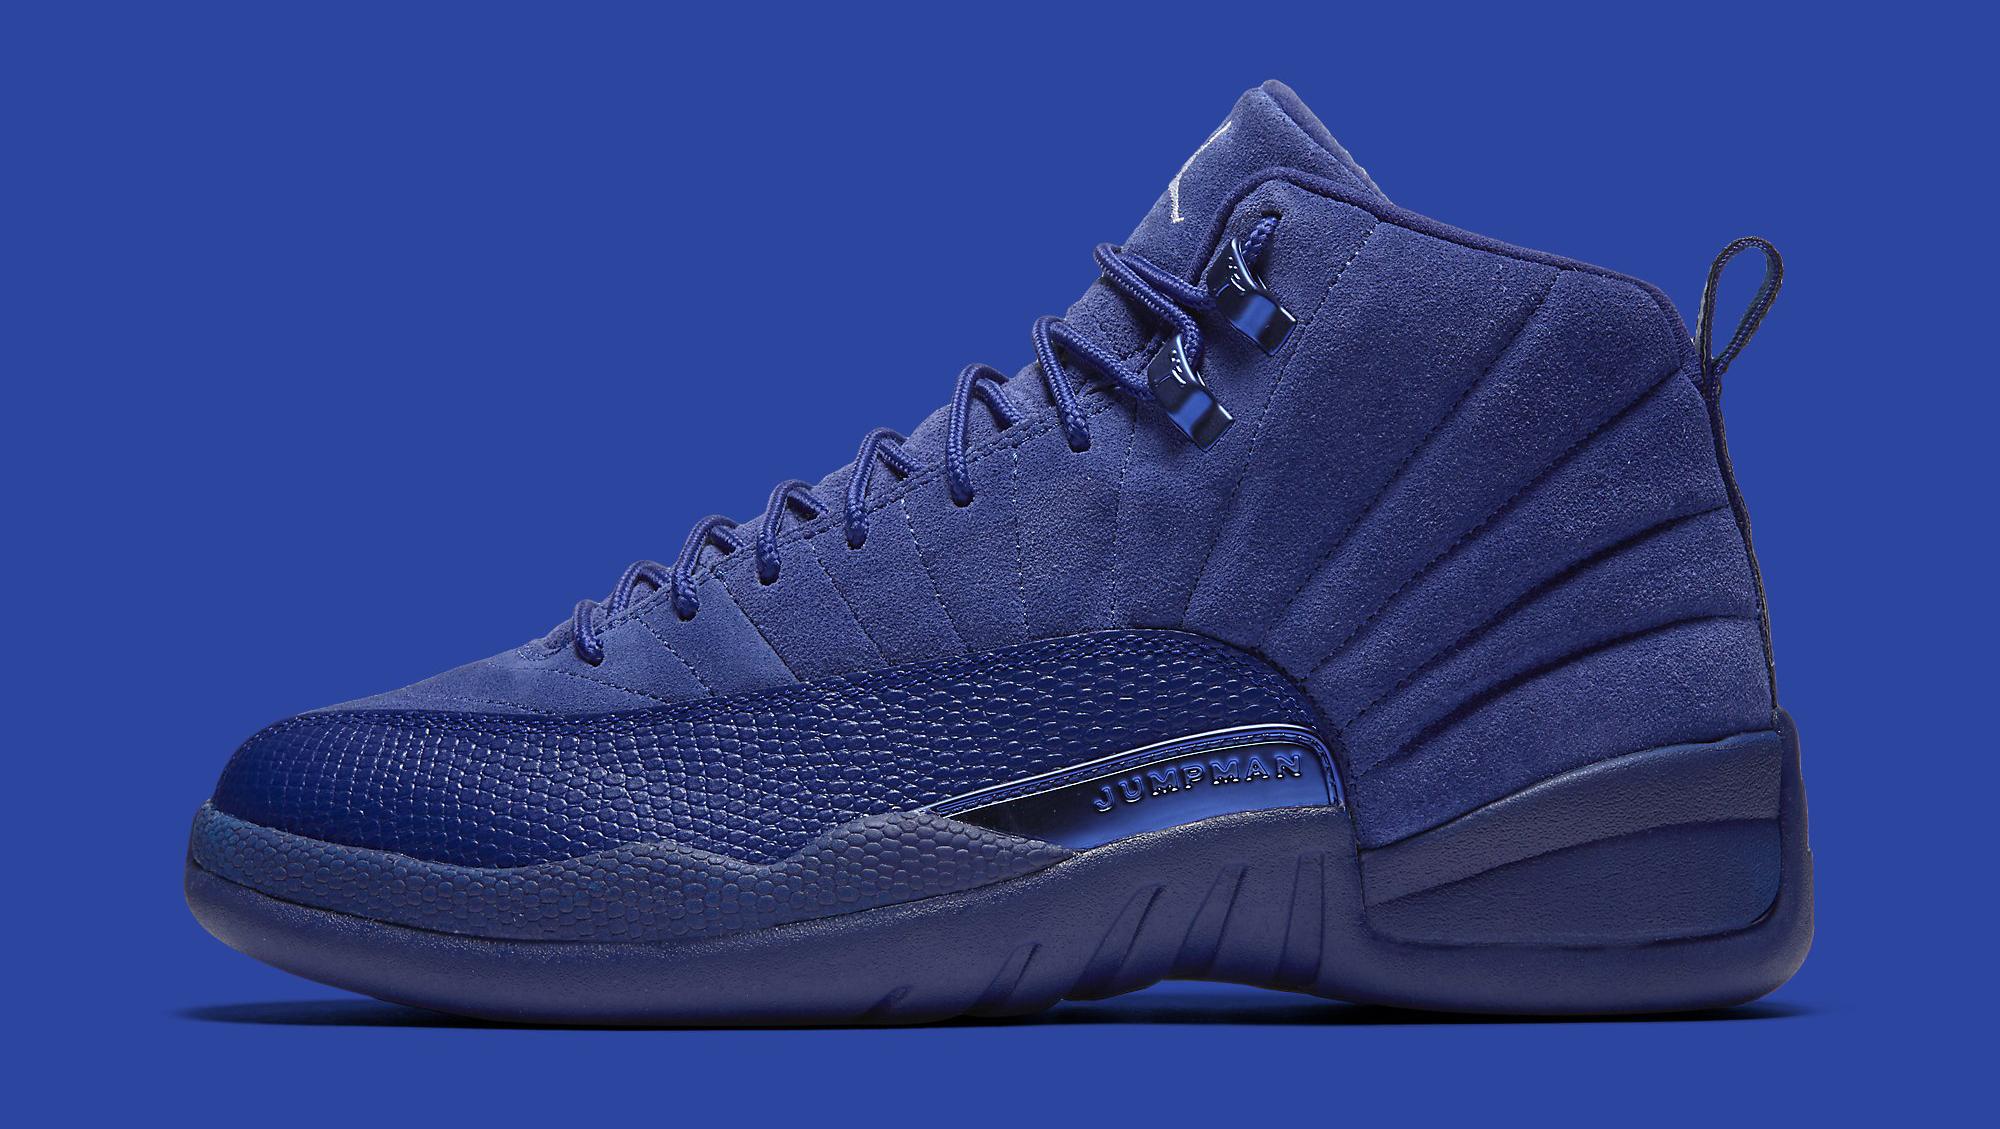 Blue Jordan 12 Profile